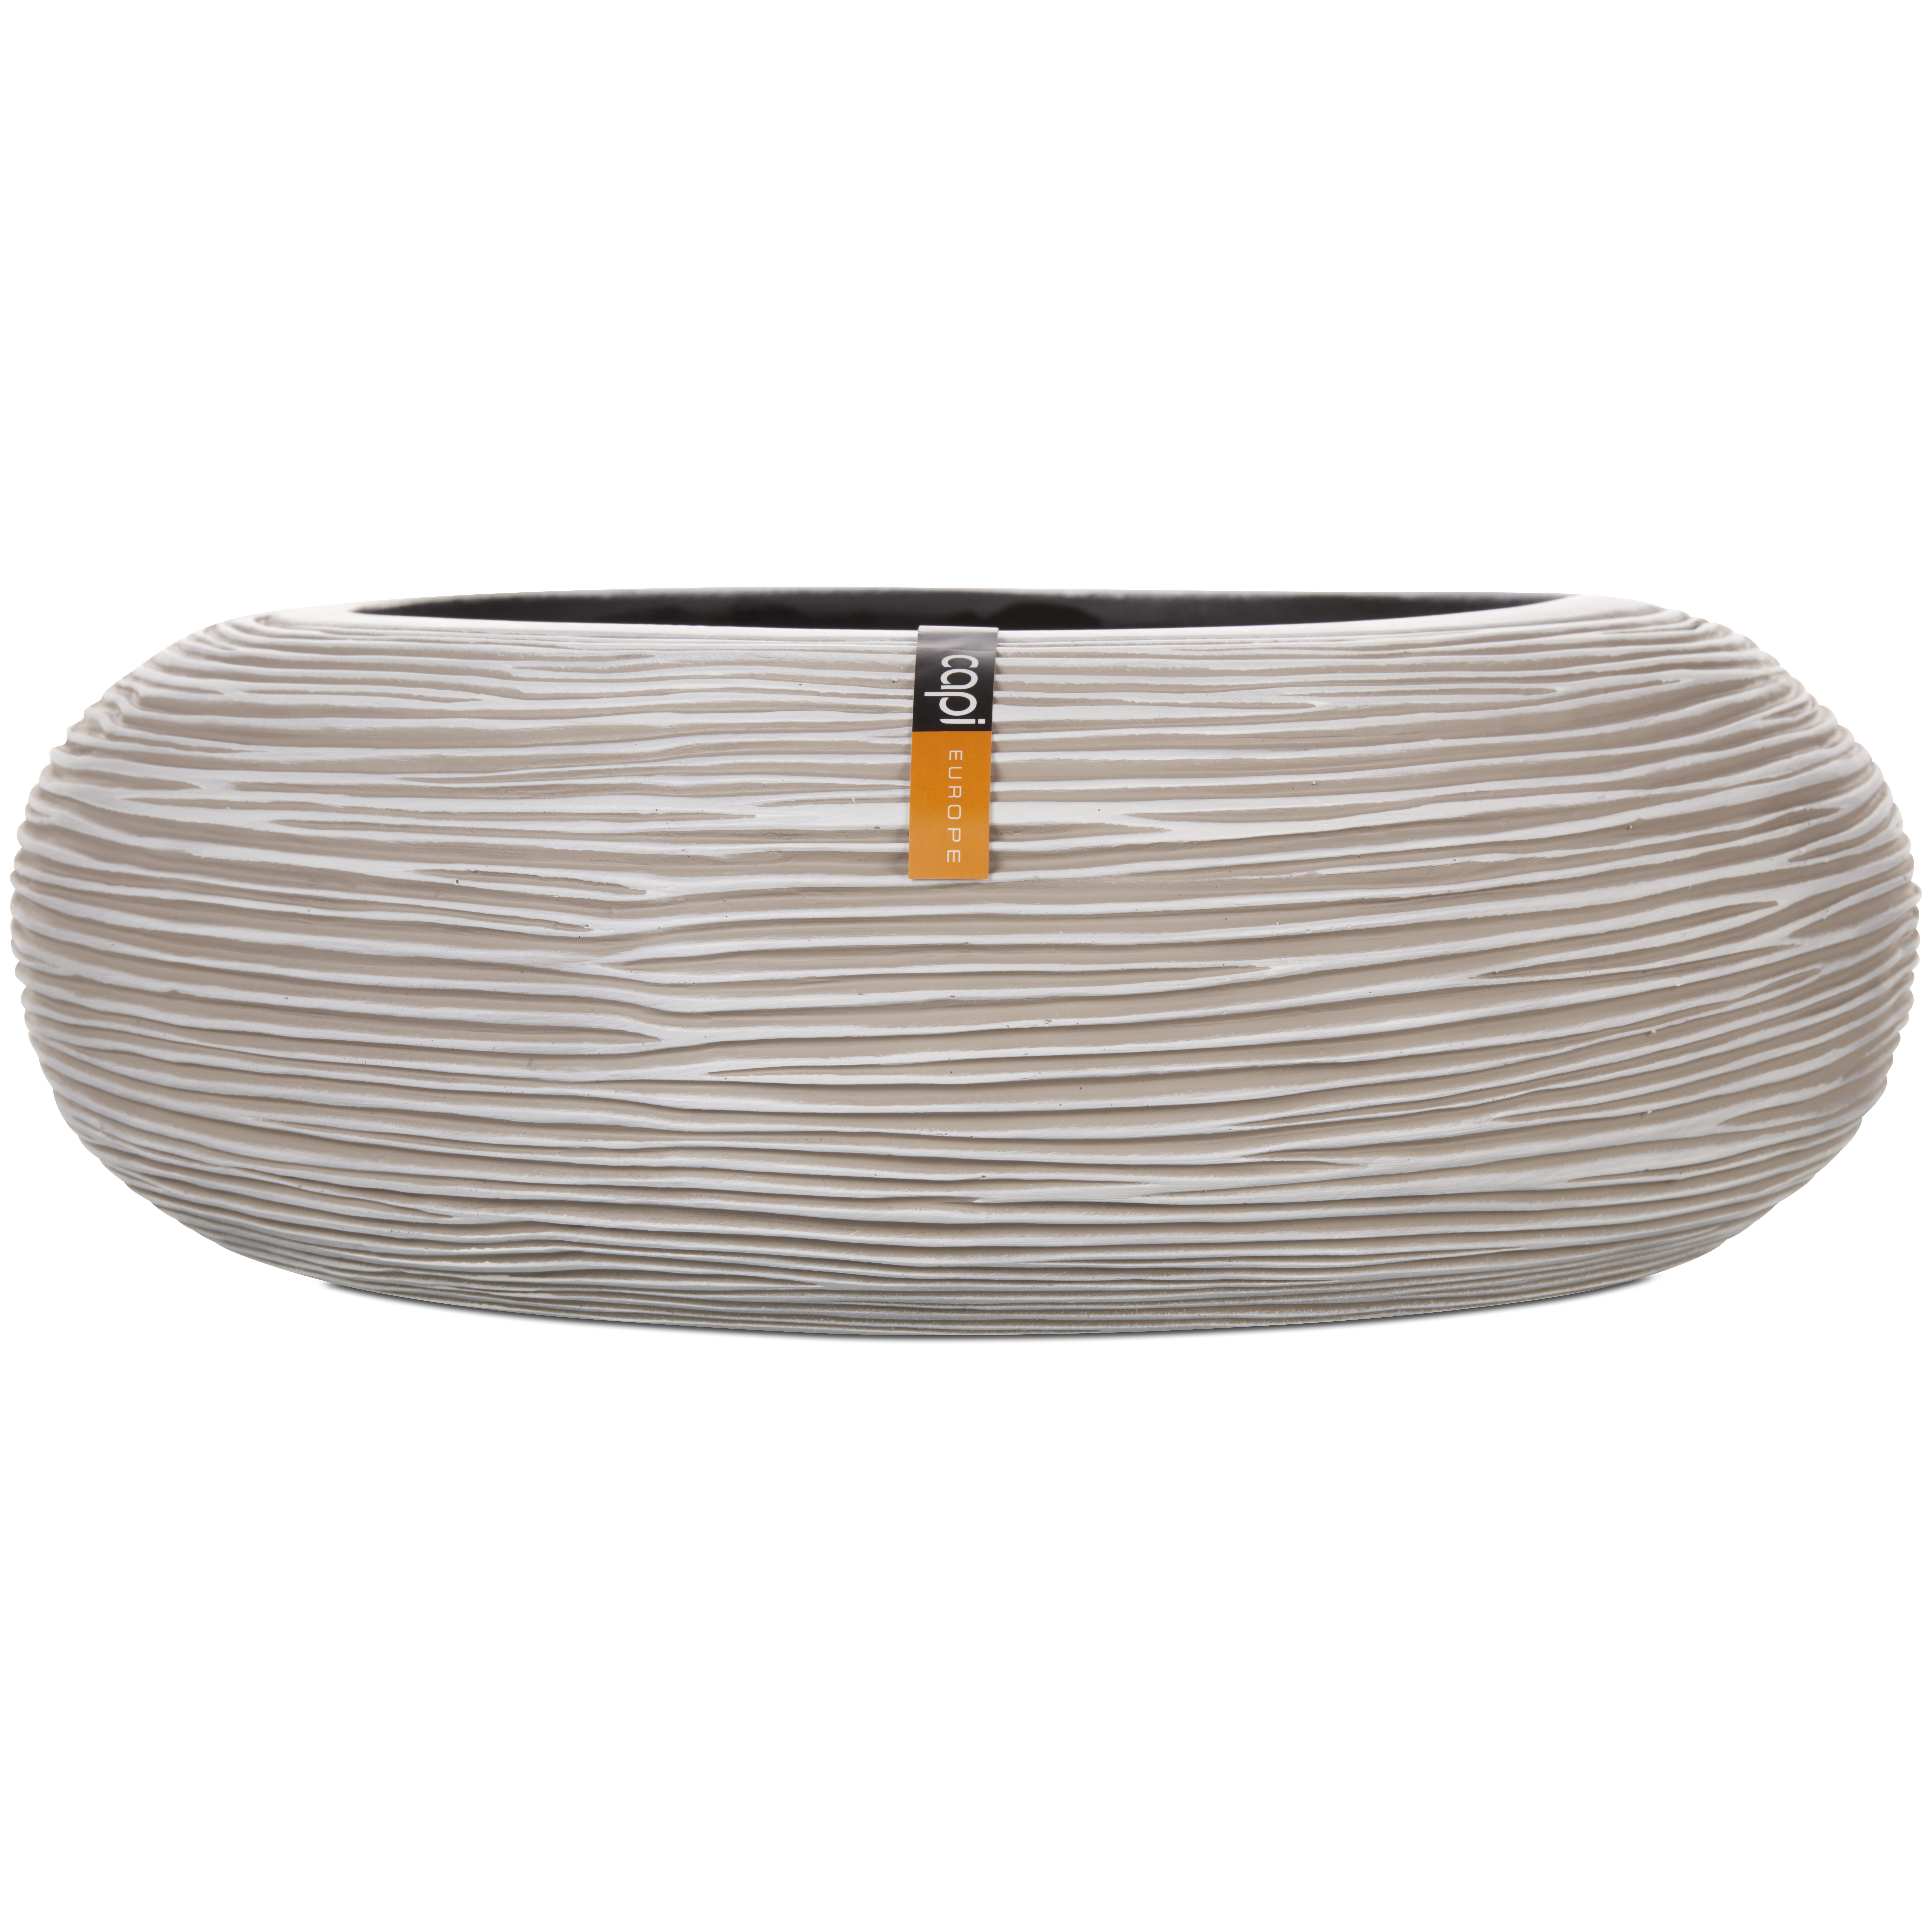 Capi Europe – Nature Rib Round Bowl – Ivory – 35cm